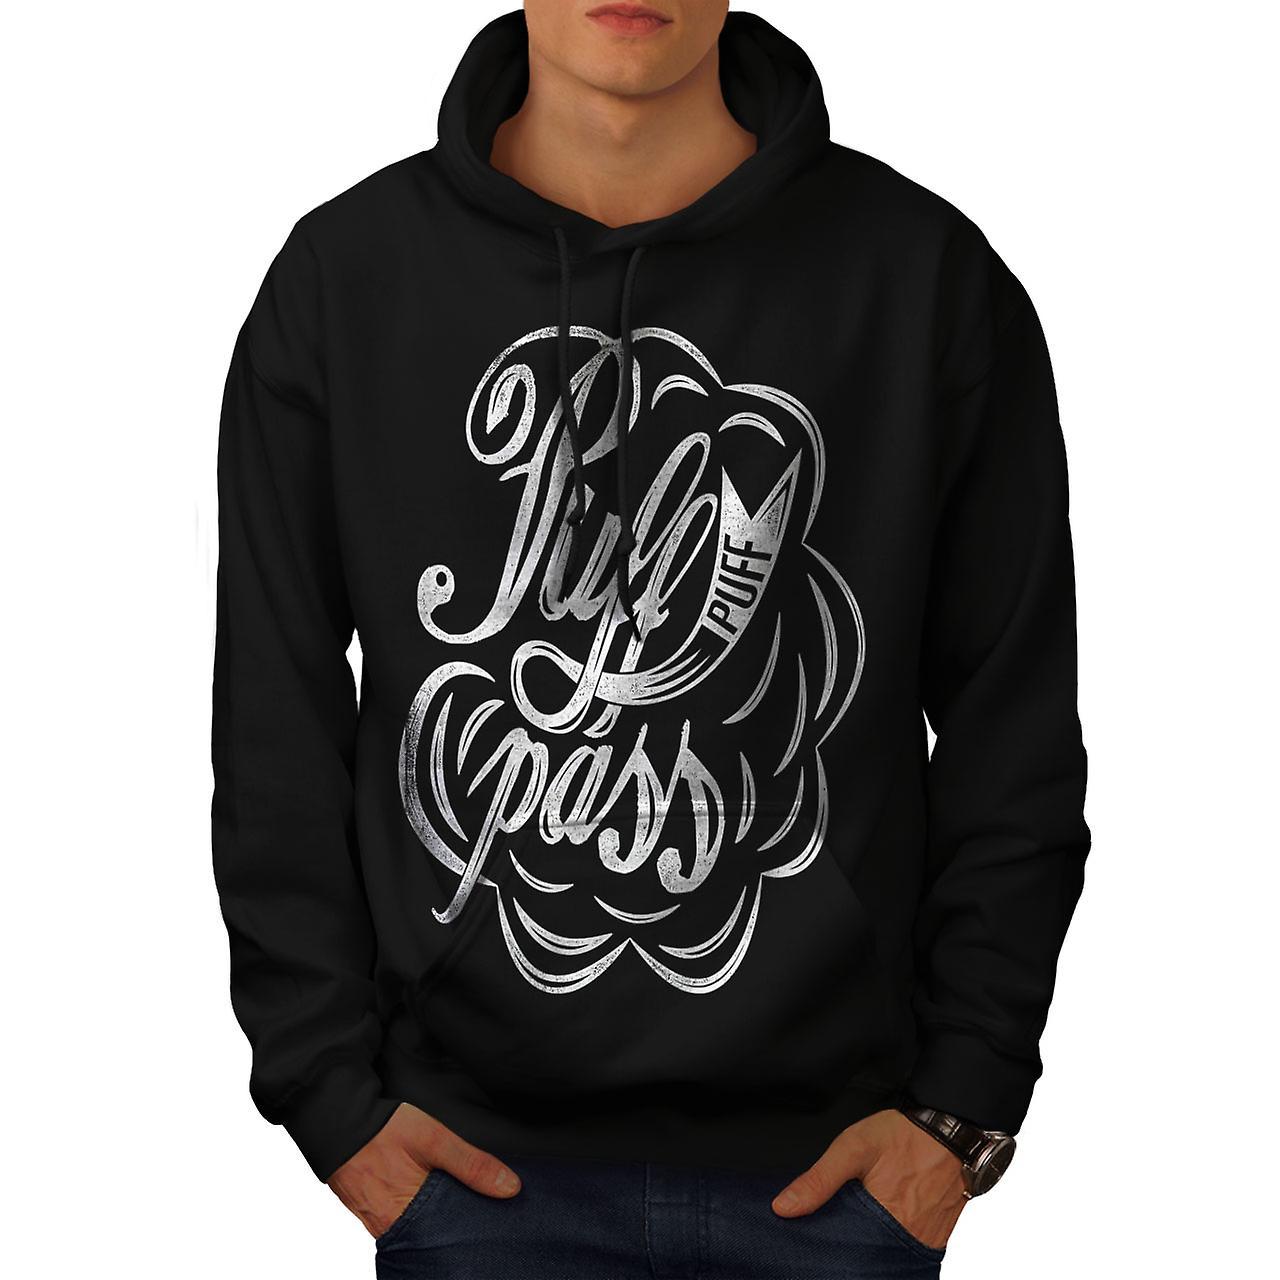 Pass Joint Weed Rasta Men Black Hoodie | Wellcoda